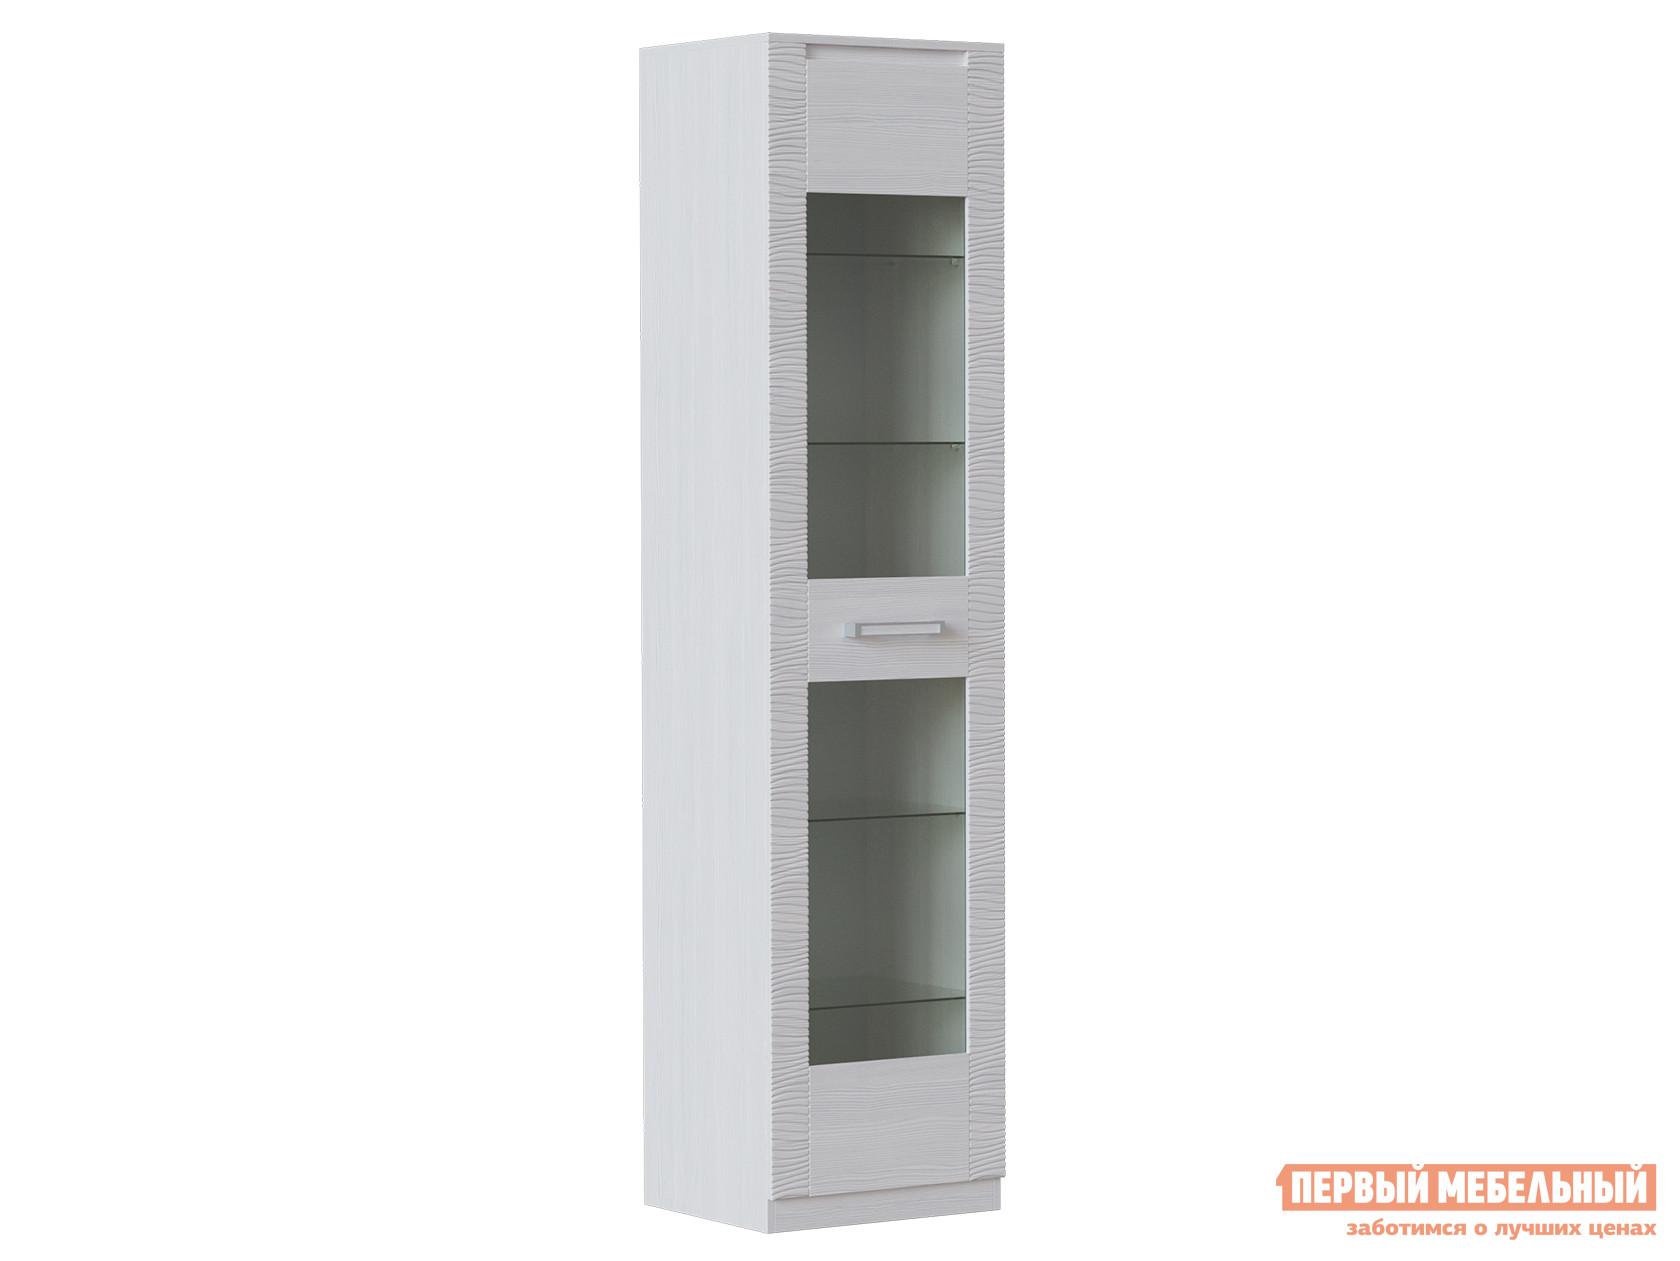 Шкаф-витрина  Элегия ШК-144 Лиственница светлая РДМ 69942